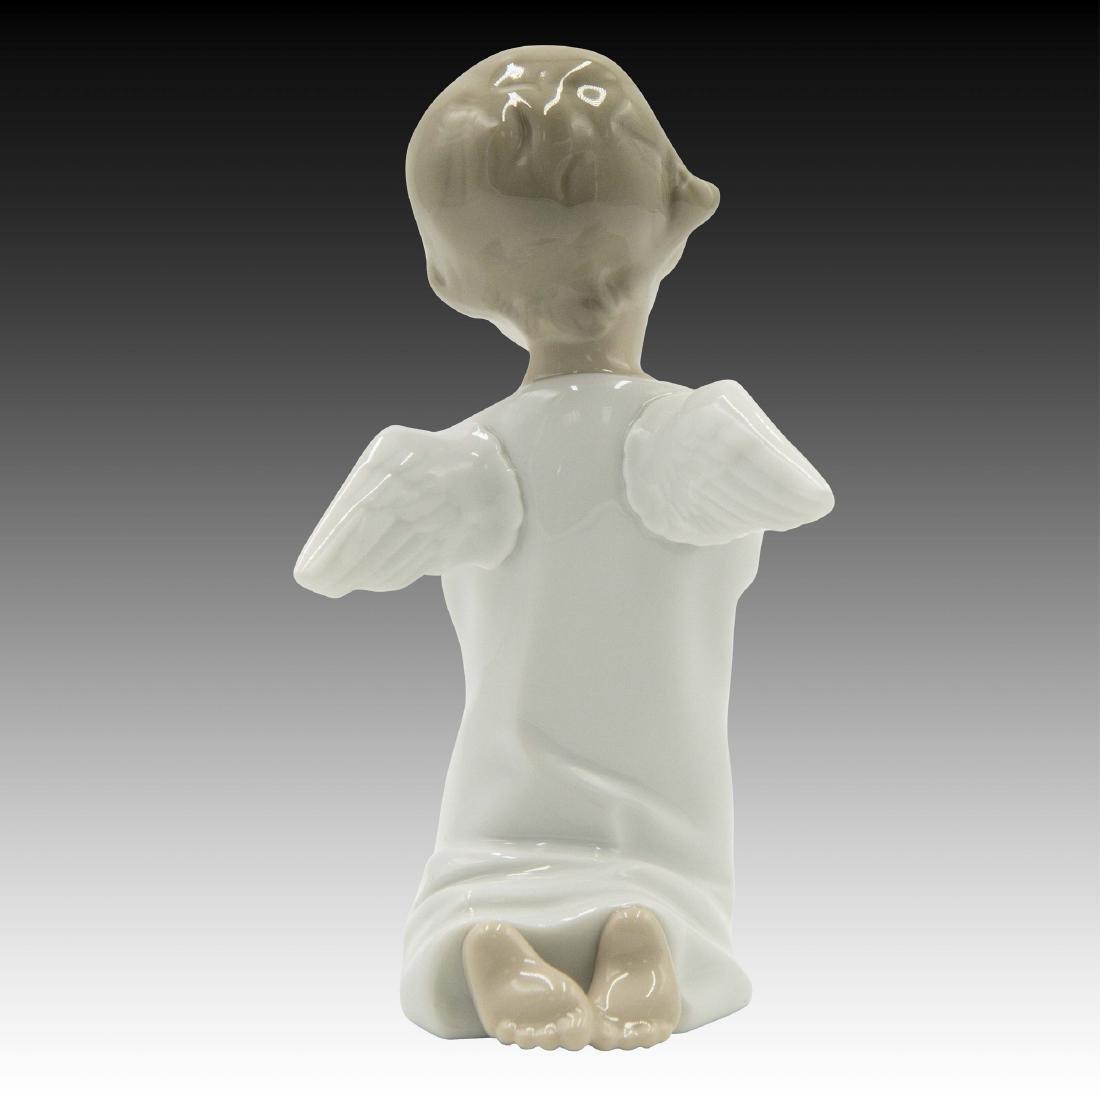 LLADRO ANGEL PRAYING FIGURINE 4538 - 4